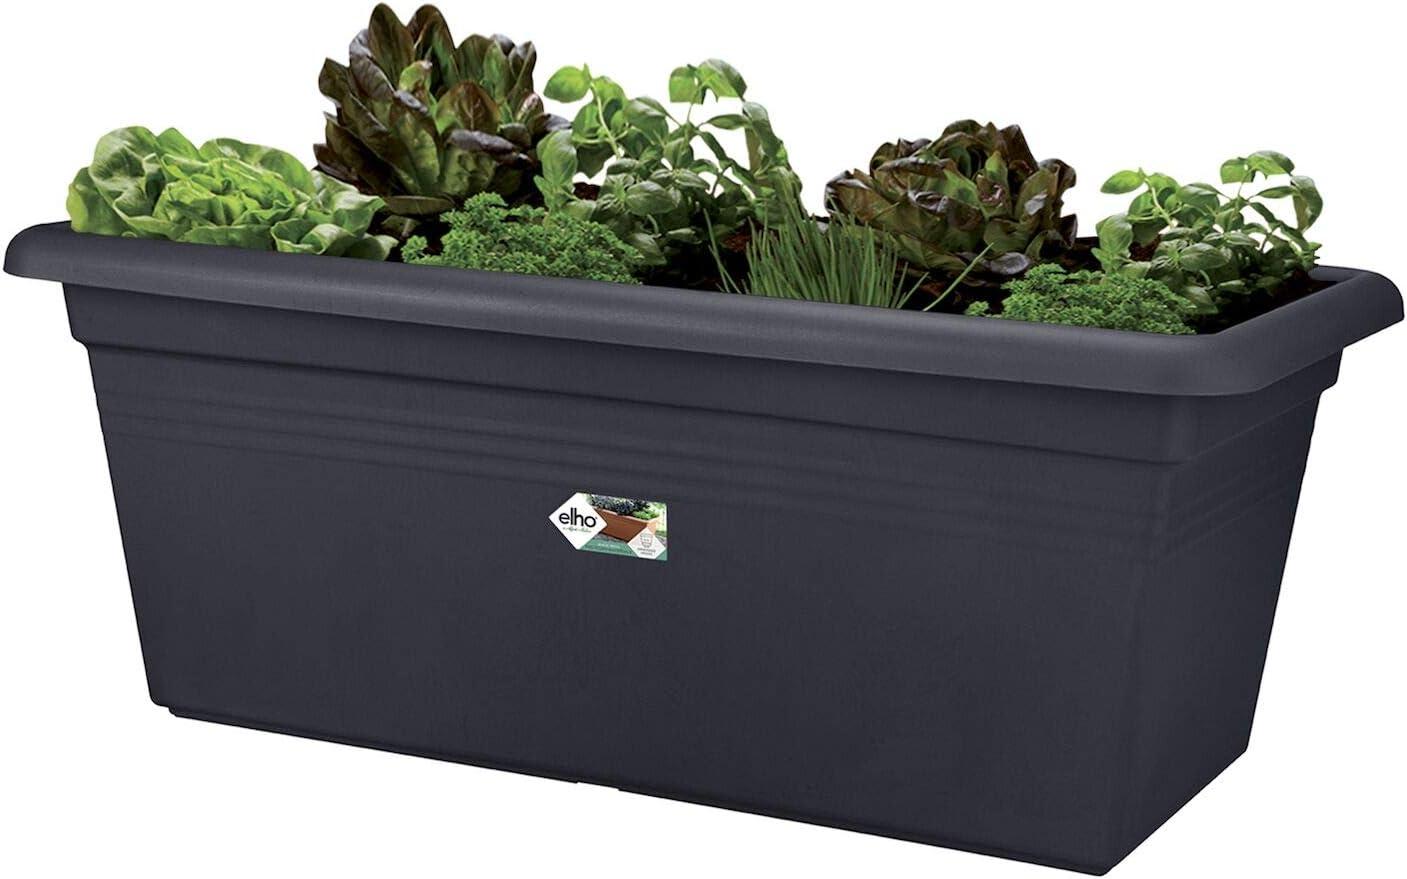 Drau/ßen L 39 x W 78 x H 34.2 cm Baumwoll Weiss Elho Green Basics Garten Xxl 80 /Übertopf